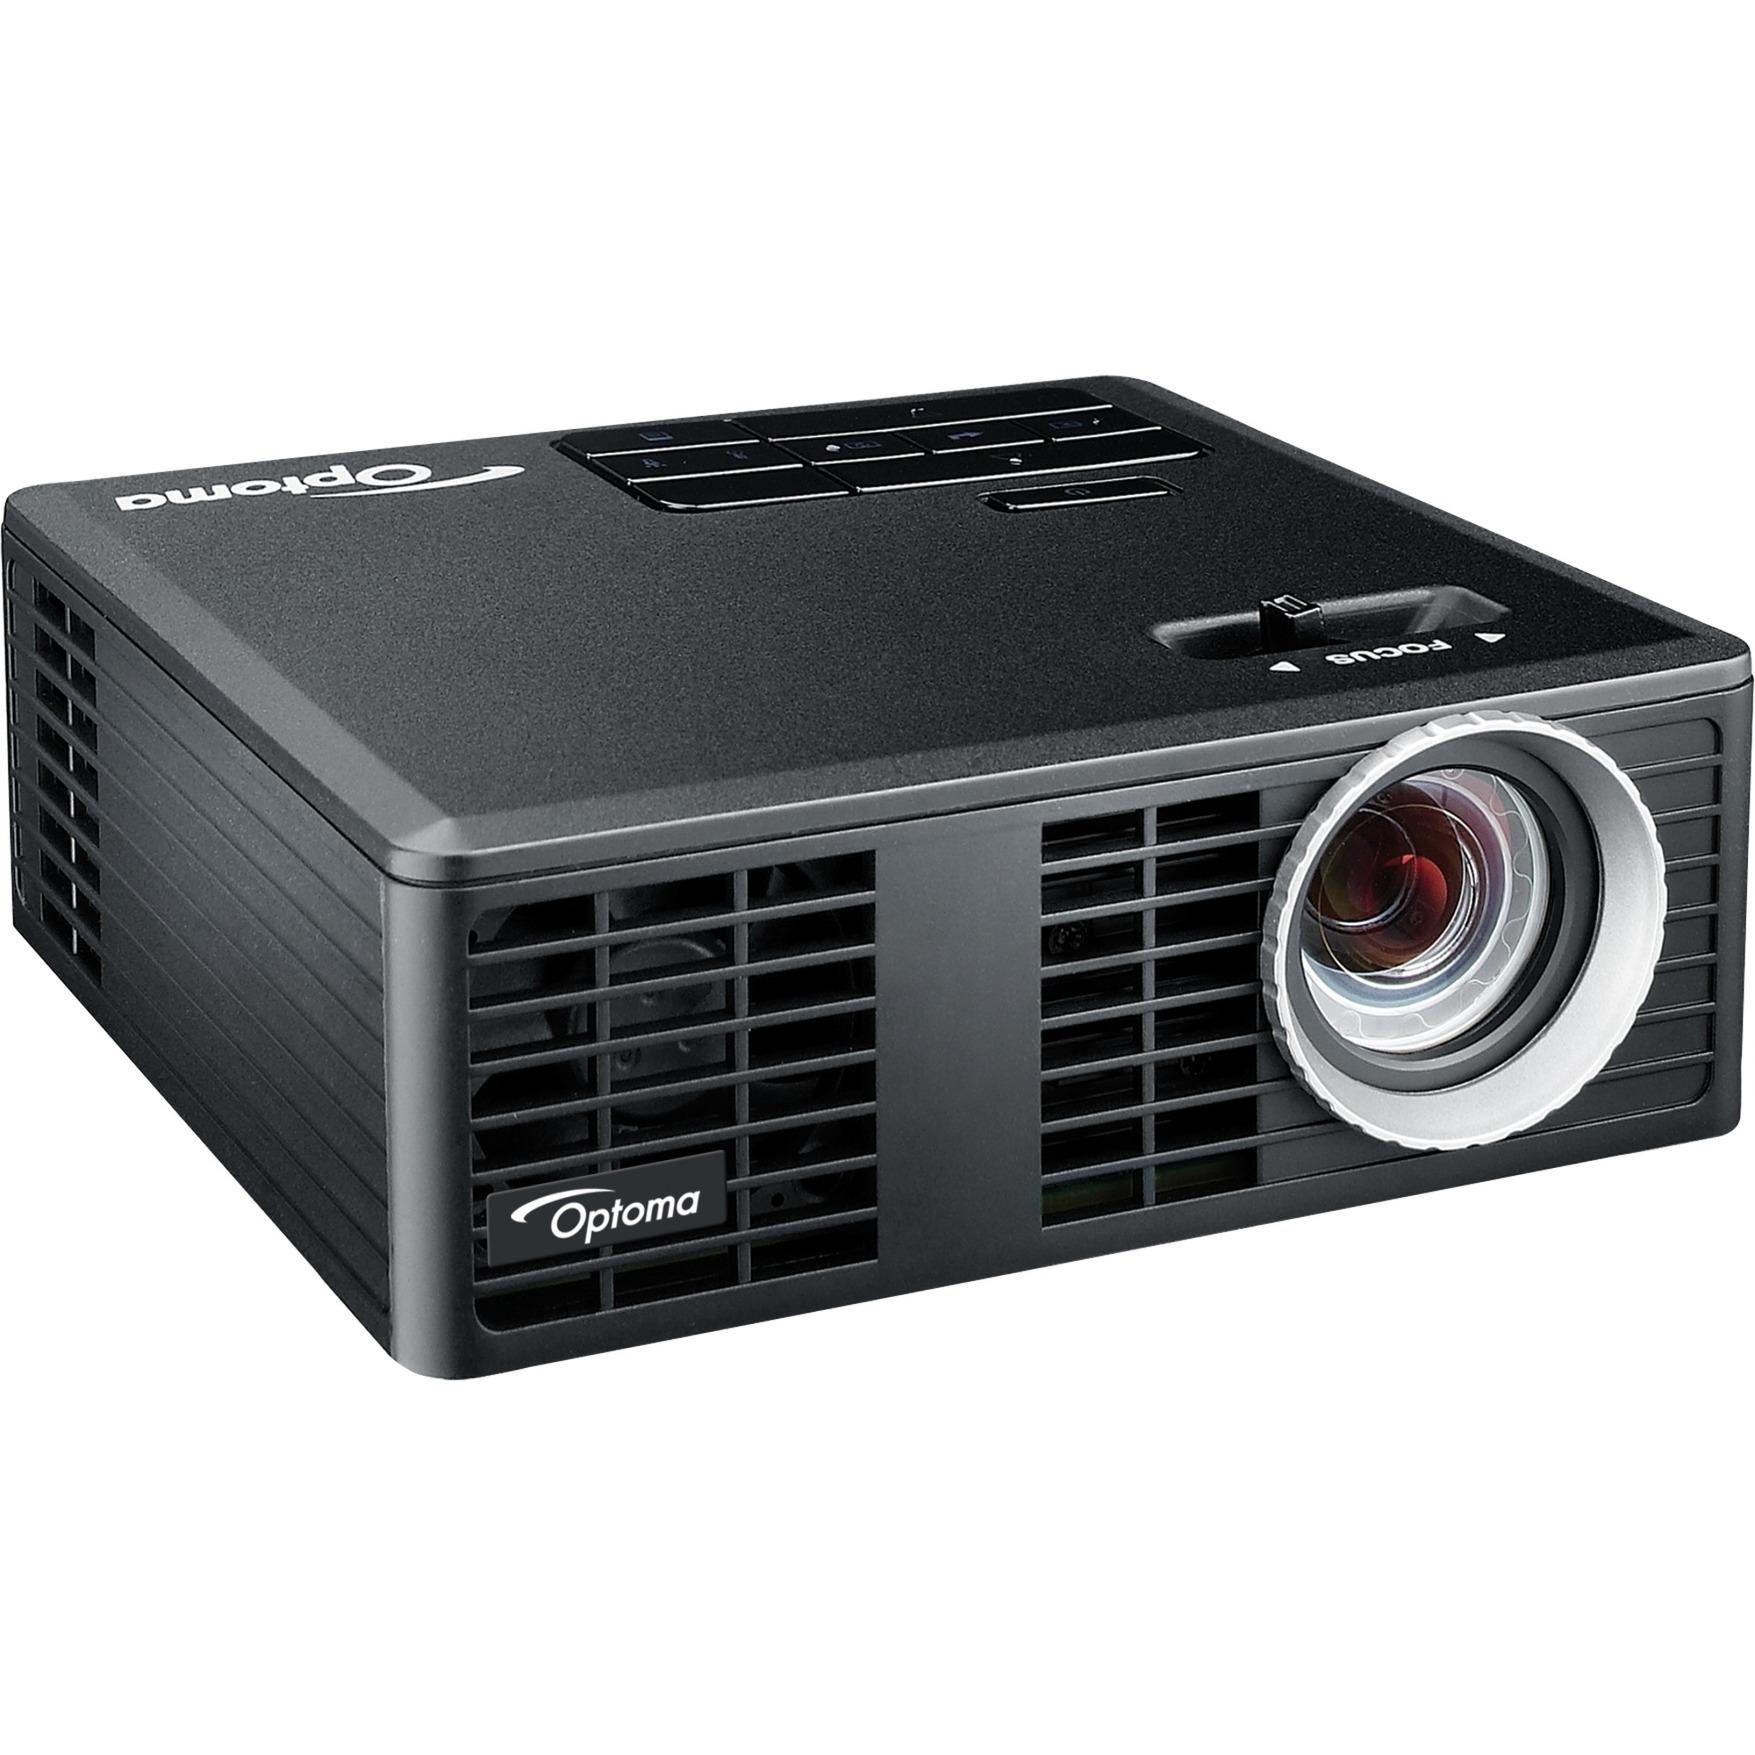 ML750e Proyector portátil DLP WXGA (1280x800) 3D Negro videoproyector, Proyector DLP